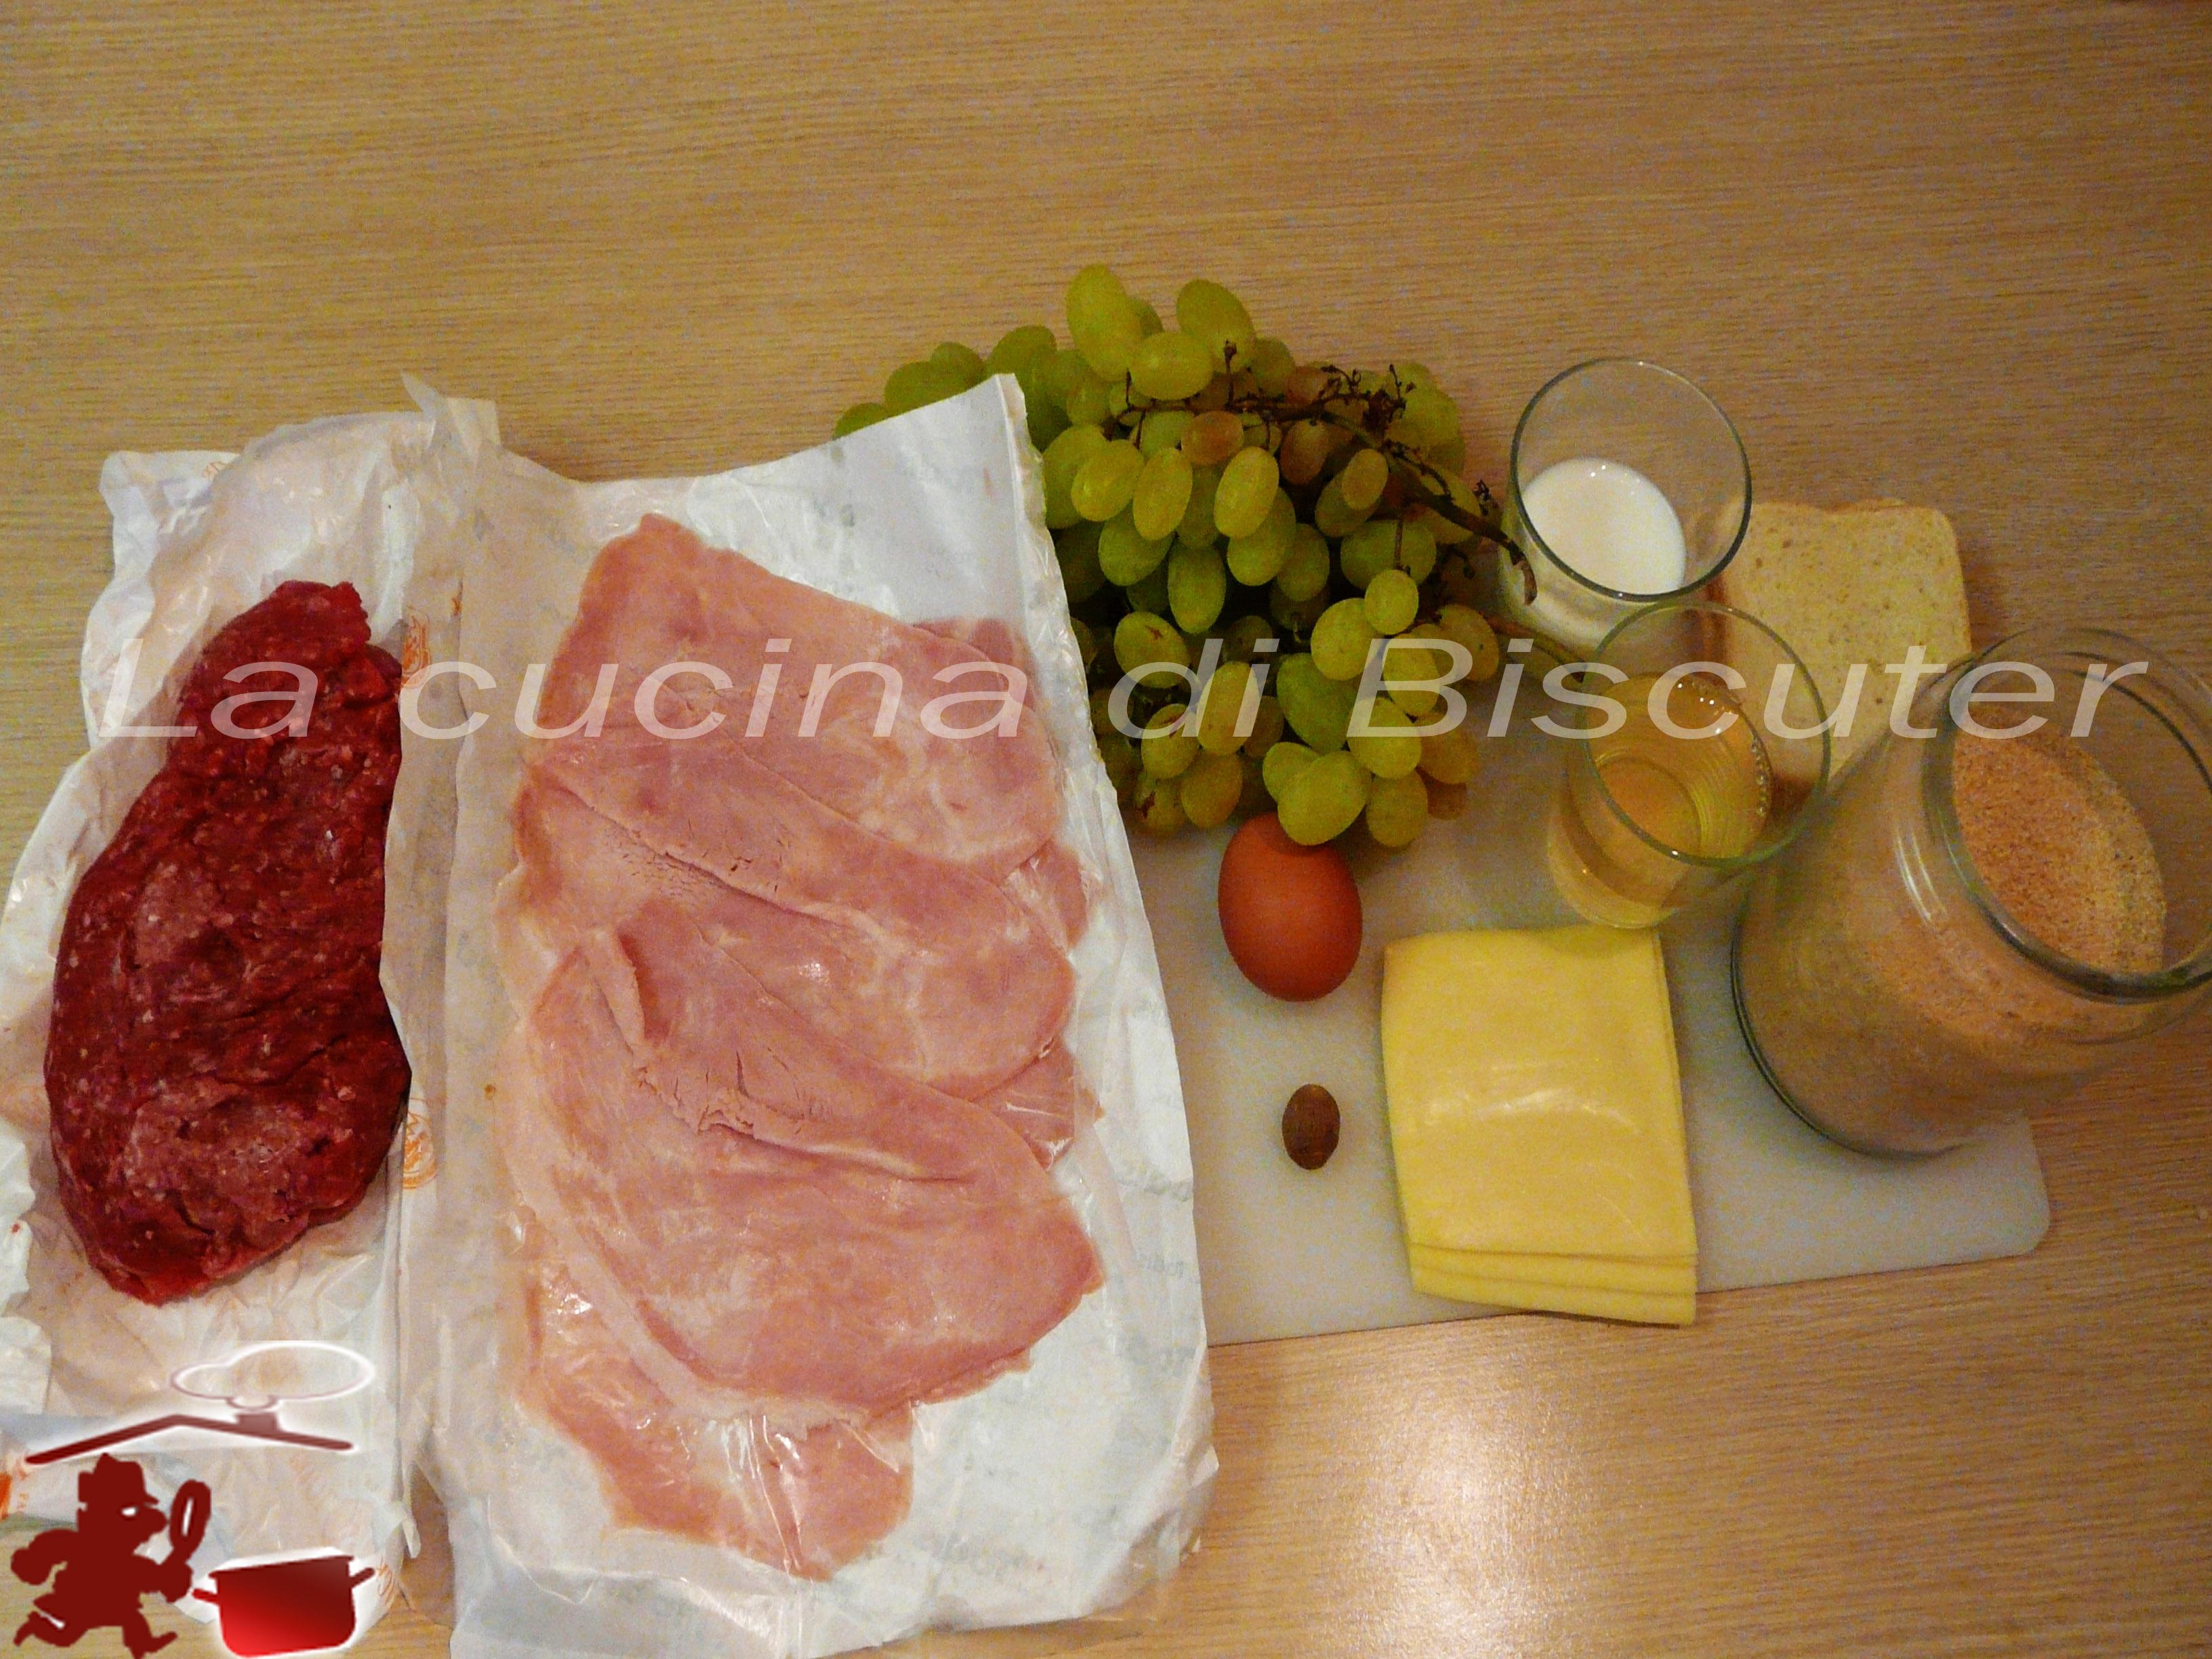 Polpettone All'uva – Meatloaf With Grapes La Cucina Di Biscuter #3C2407 3264 2448 Polpettone Classico Cucina